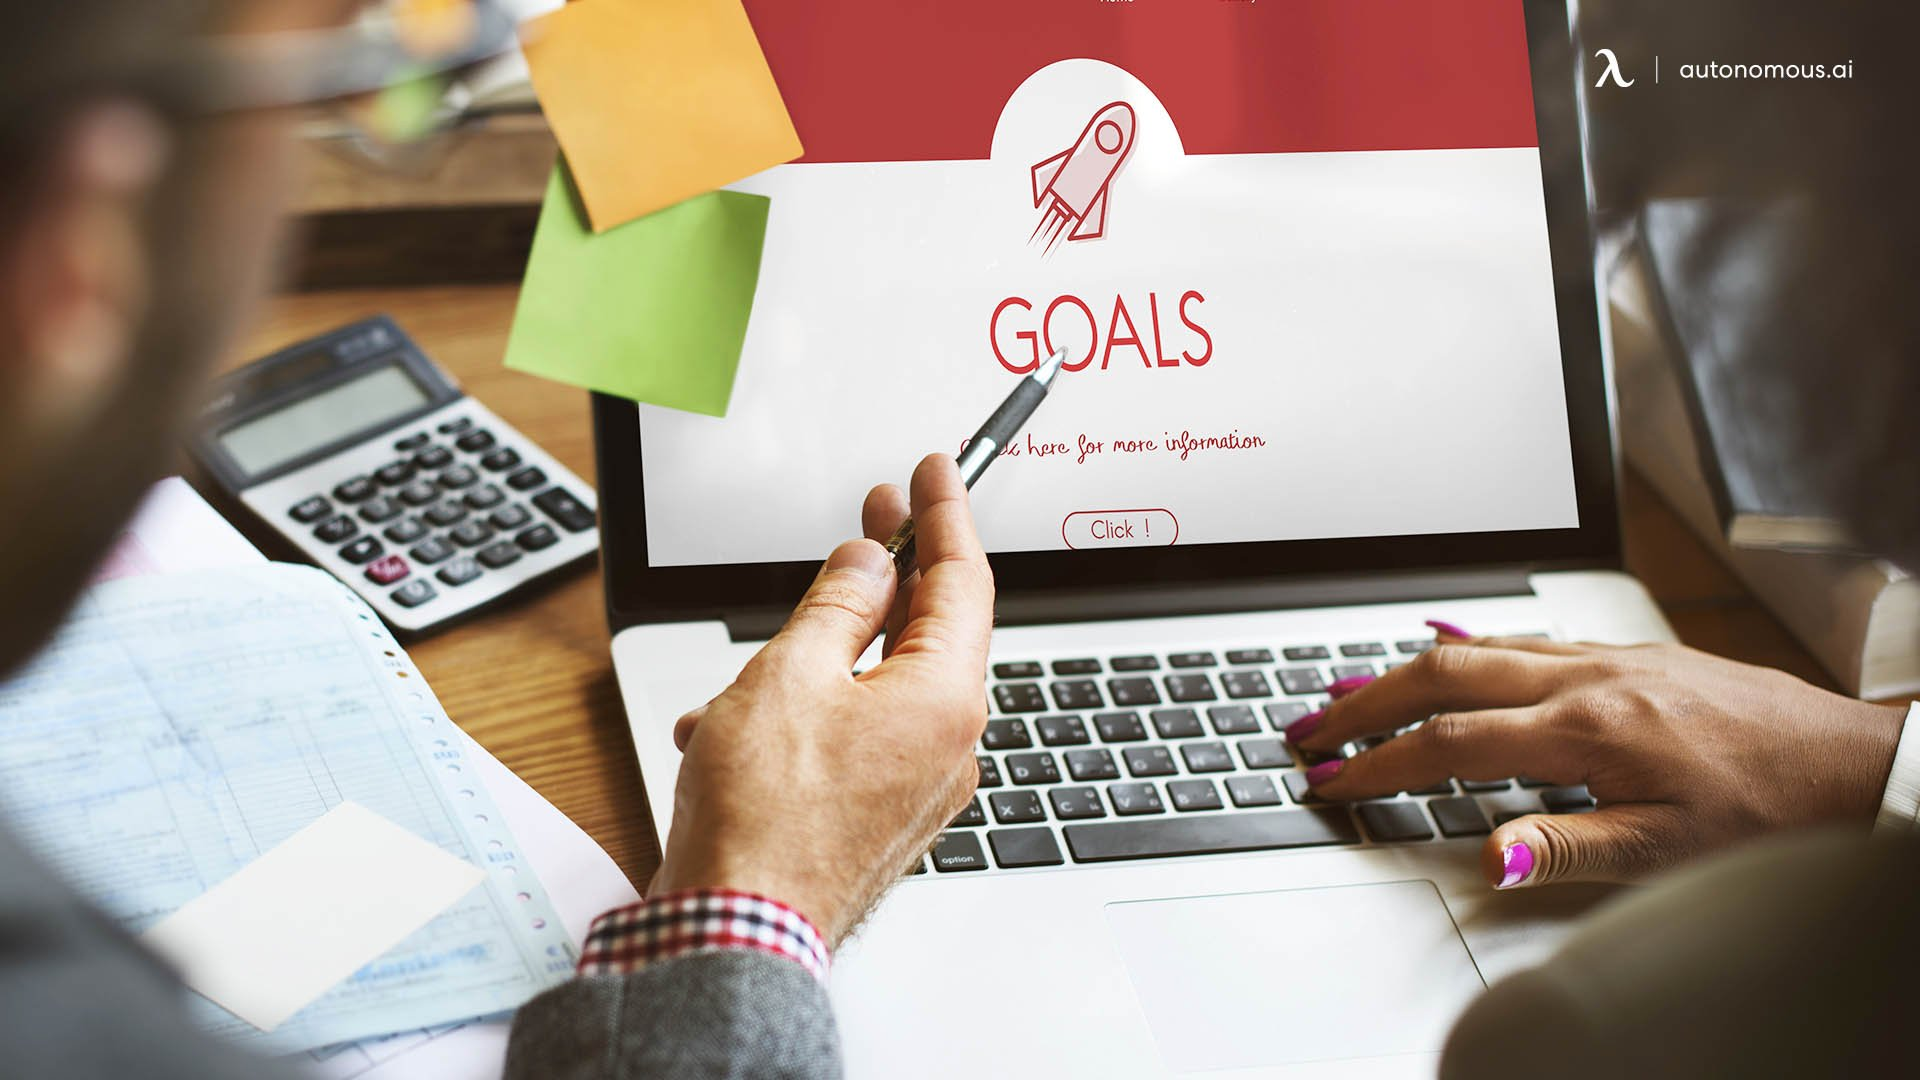 Set Frequent Measurable Goals